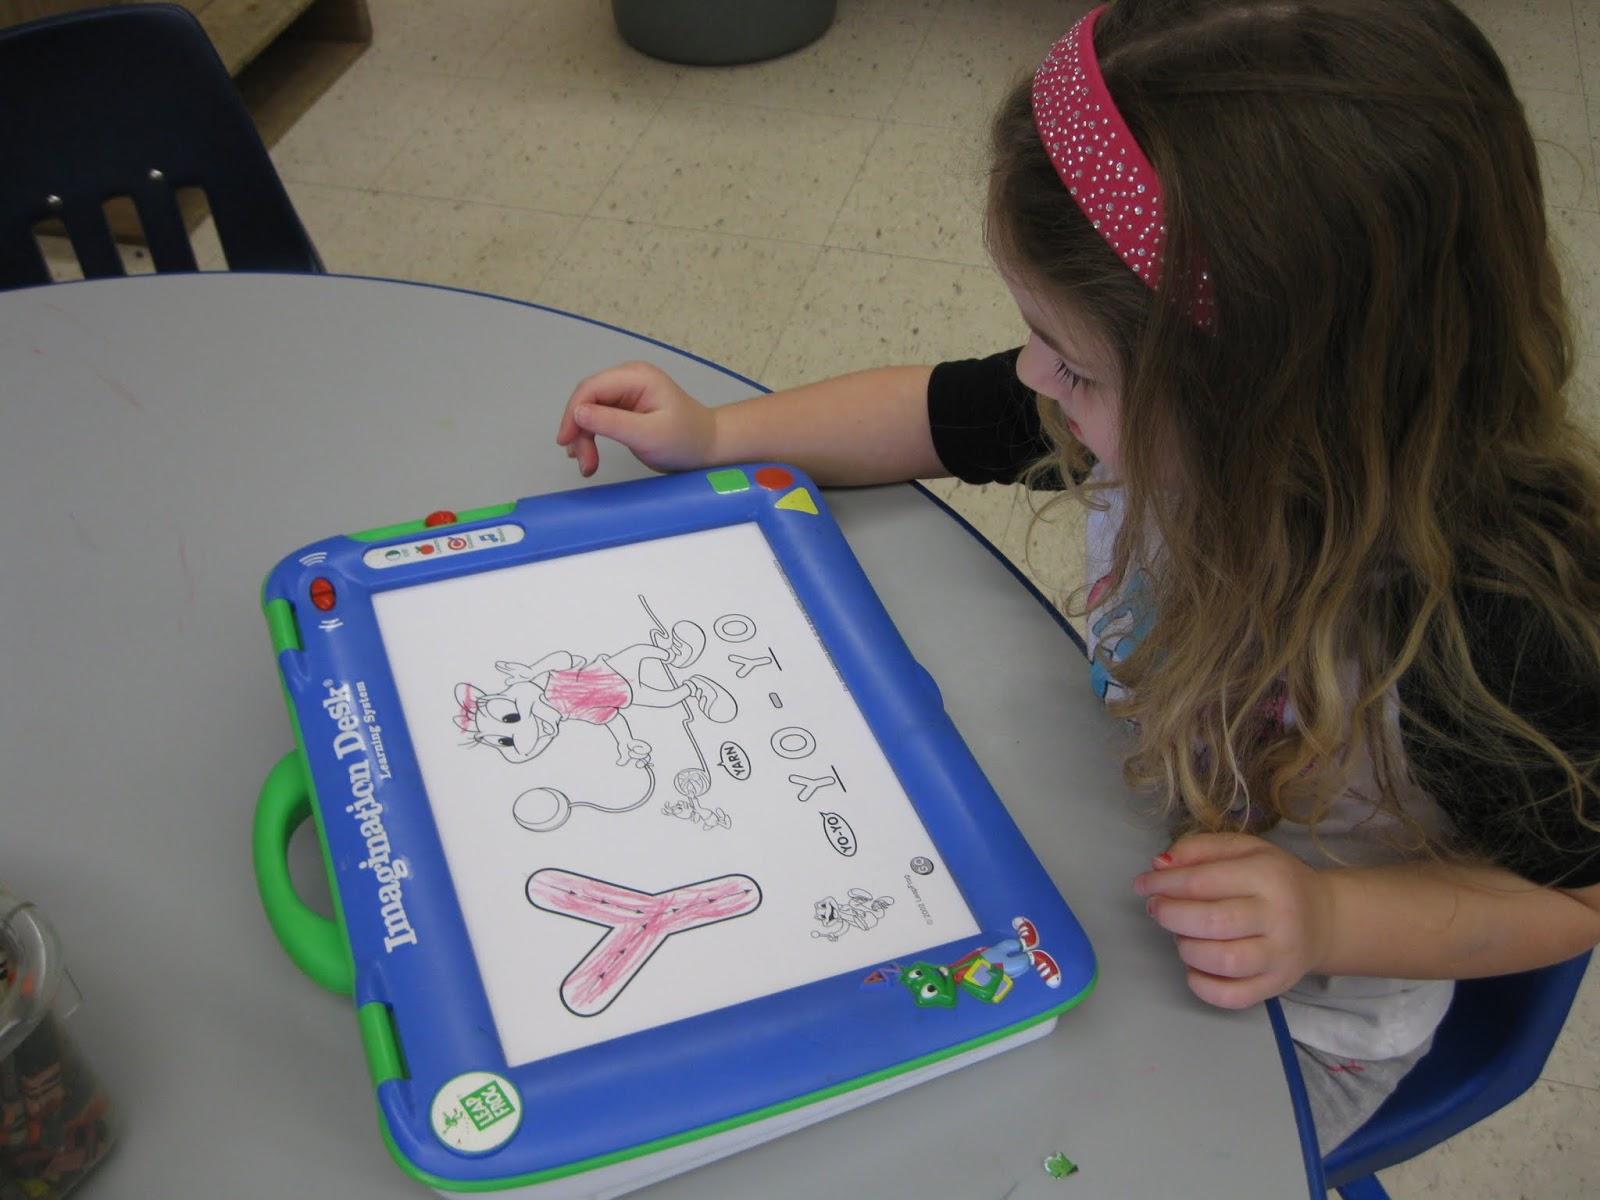 leapfrog coloring pages imagination desk - photo#25